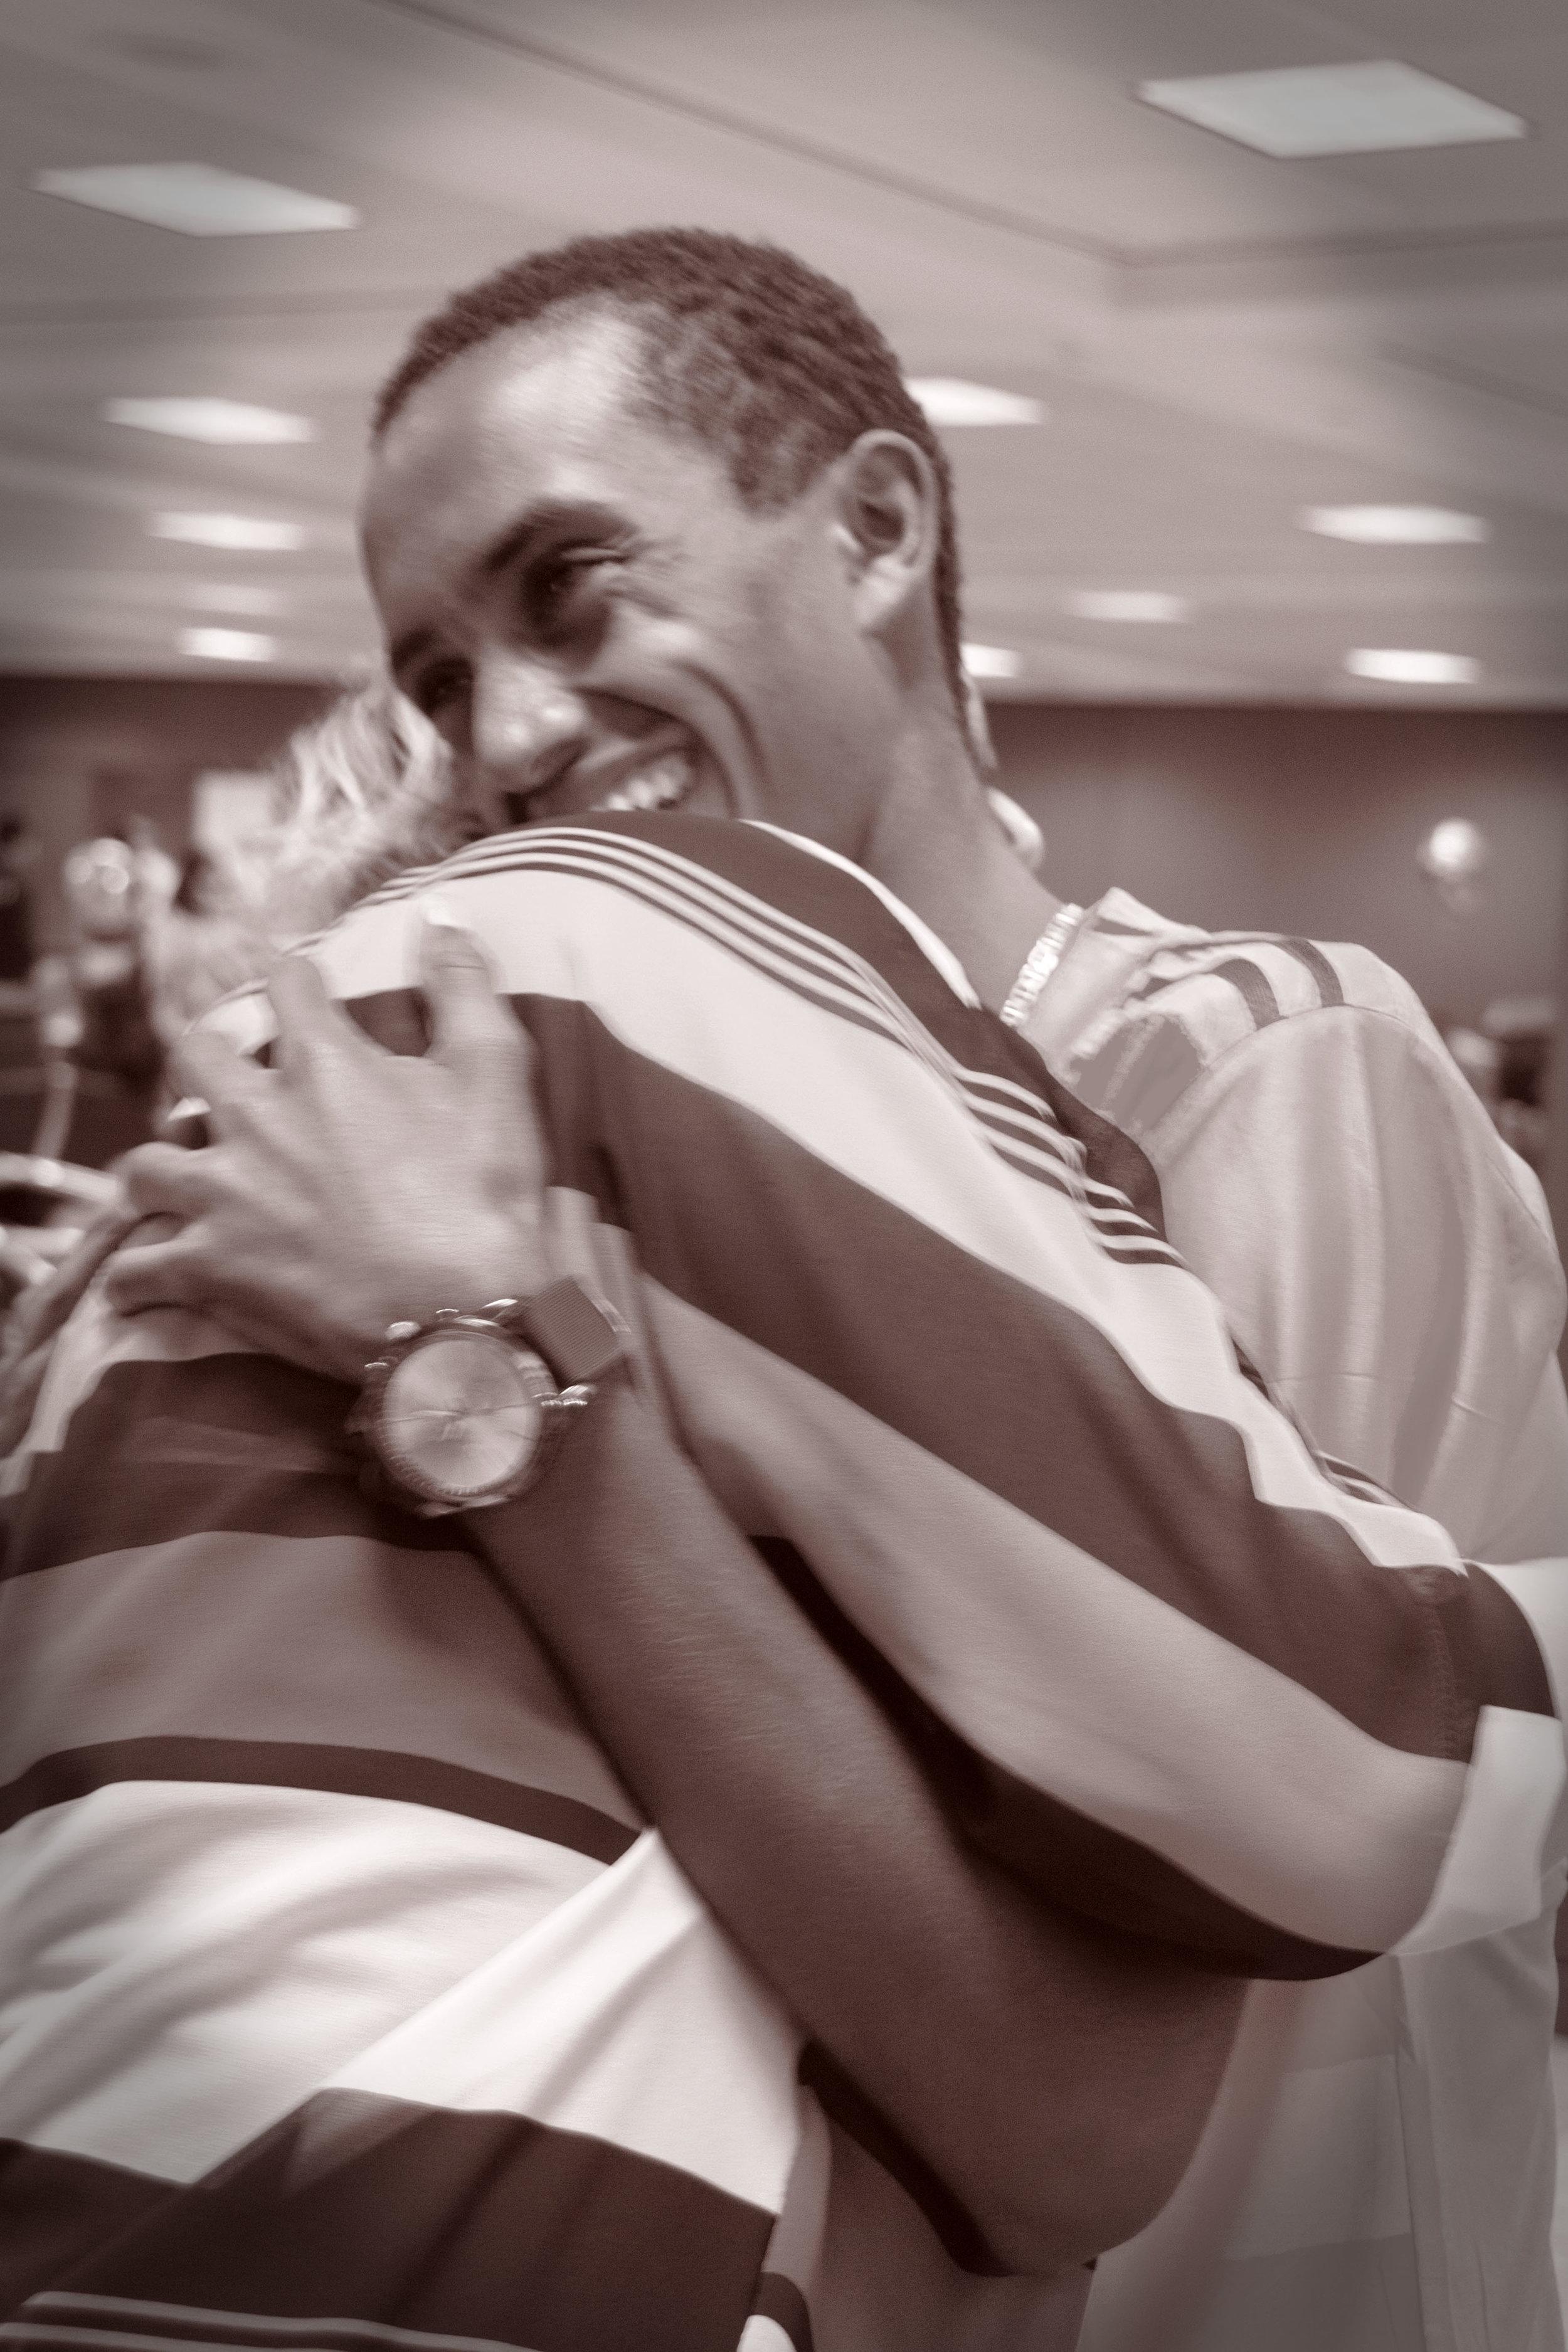 s hug amy bw.jpg